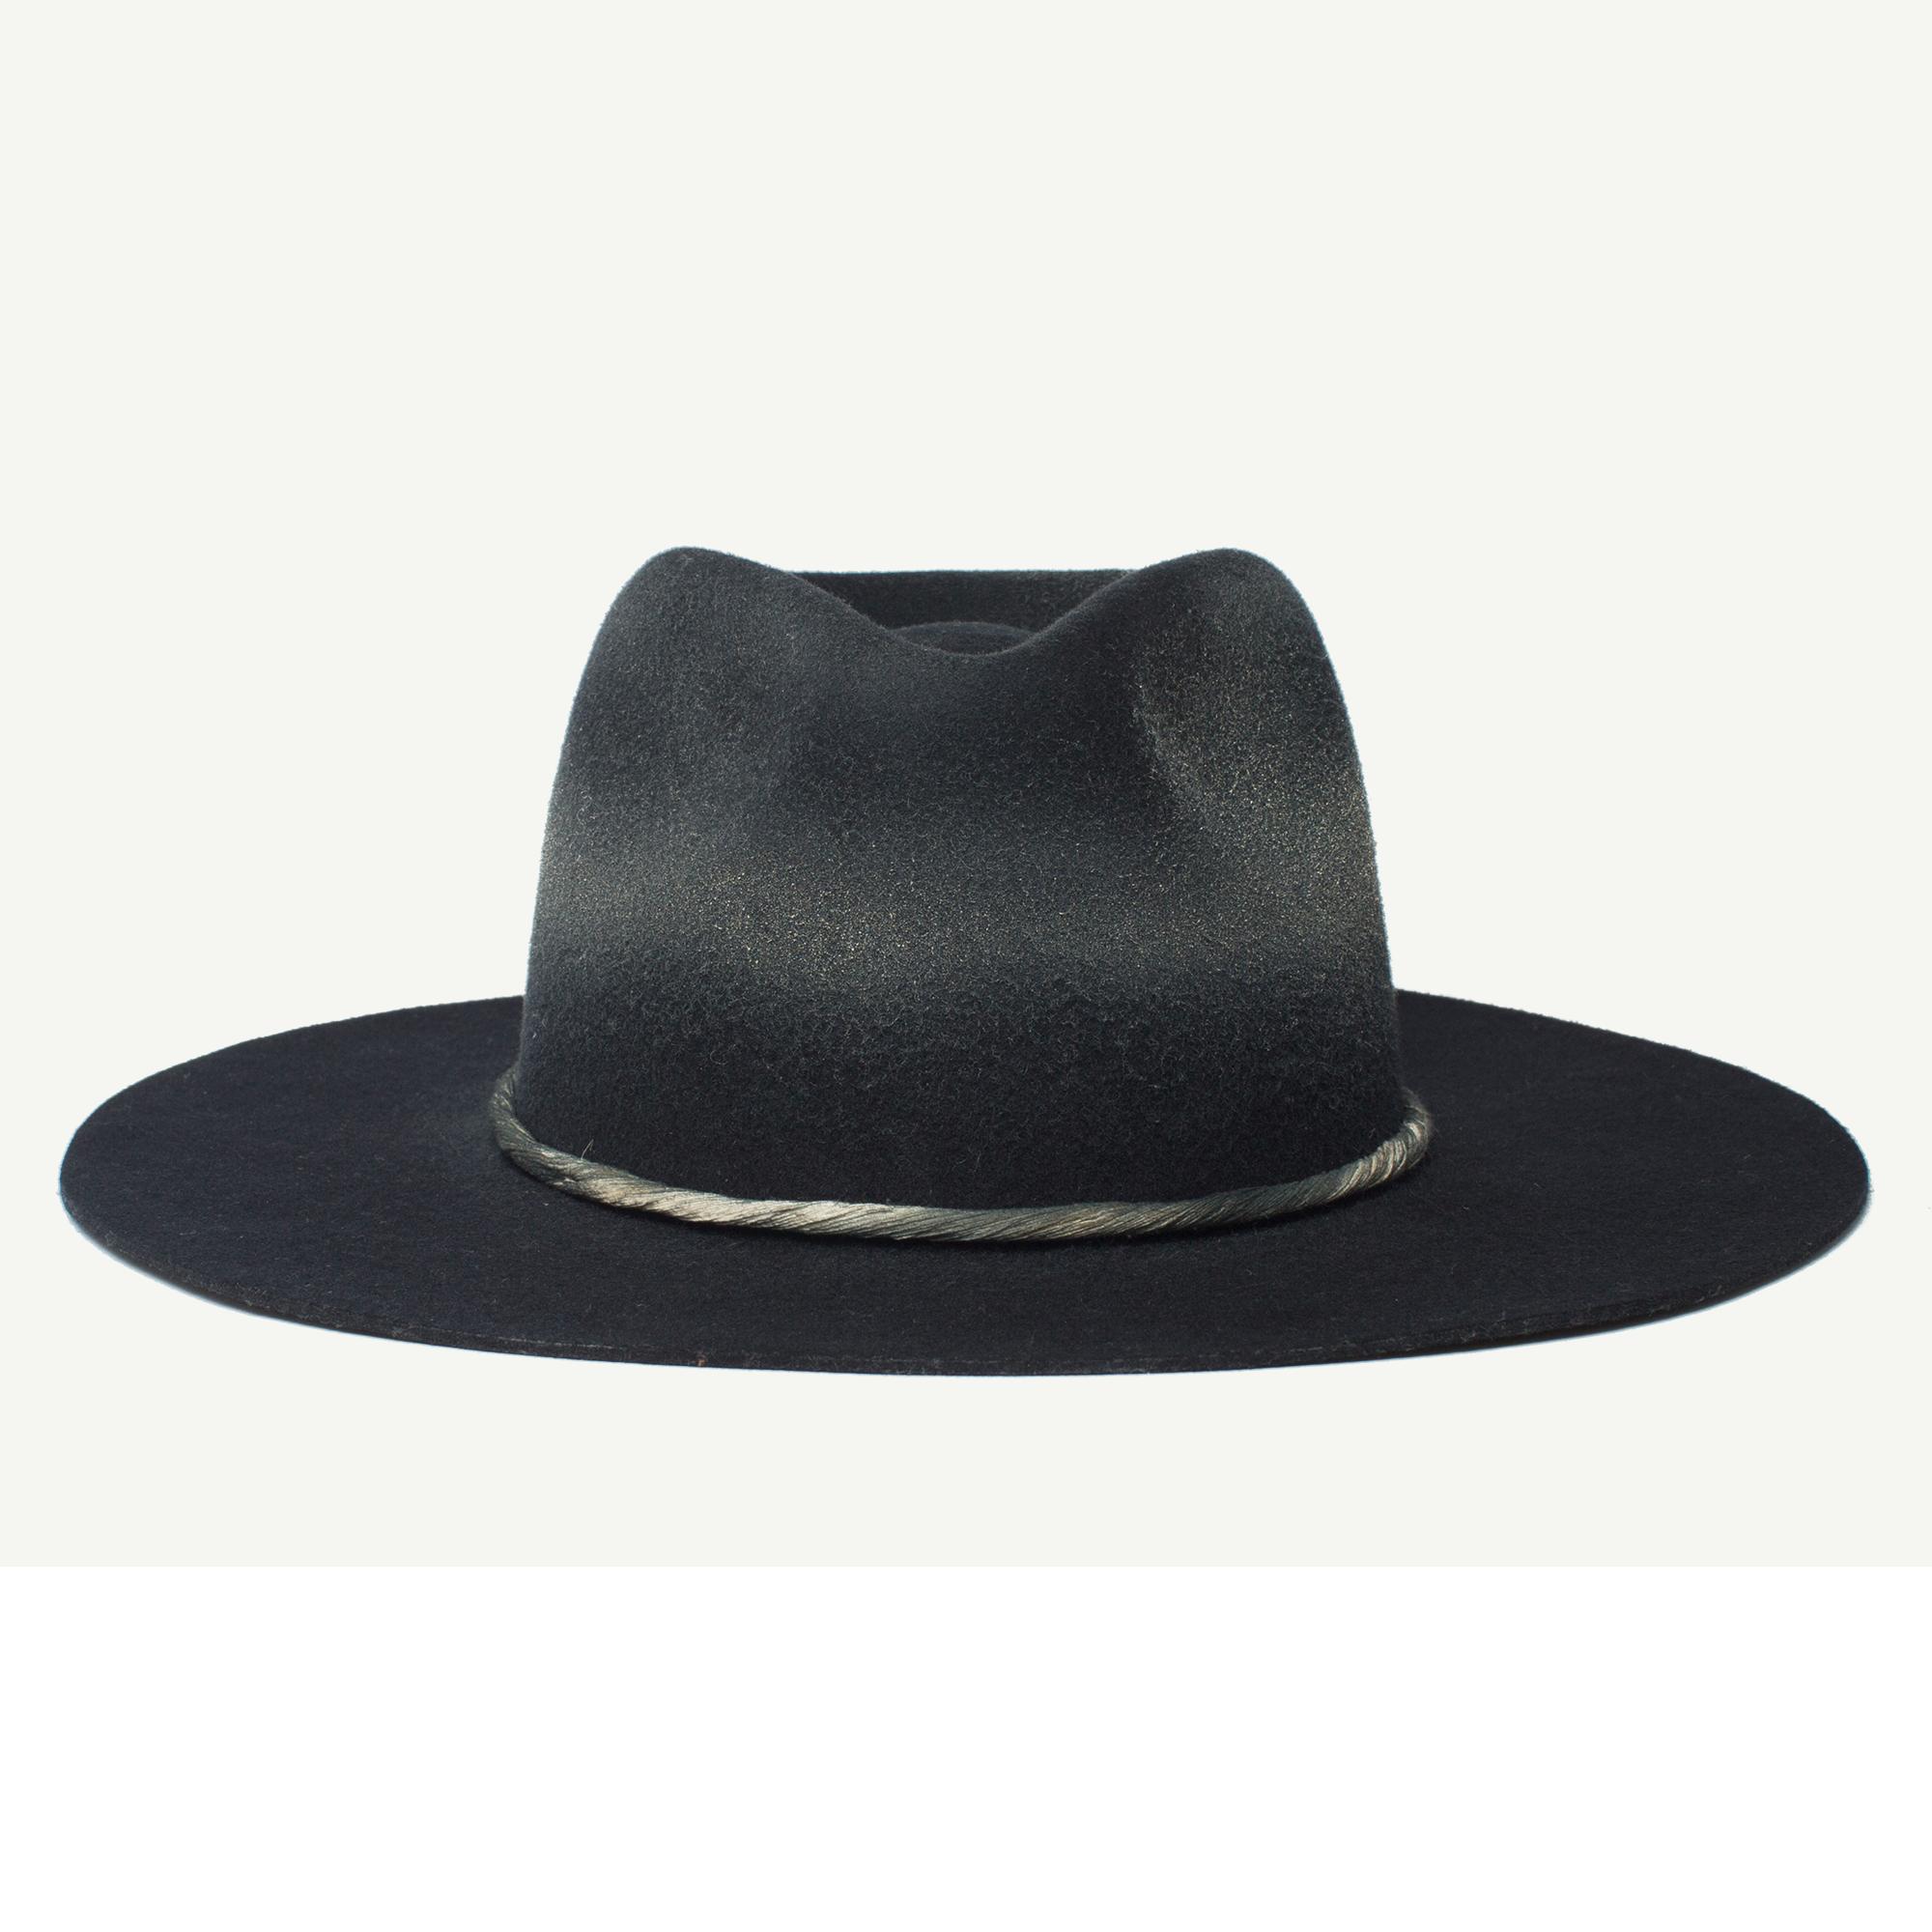 Mr Nix Black Felt Wide Brim Fedora Hat Front View Hats For Men Wide Brim Fedora Xl Mens Fashion